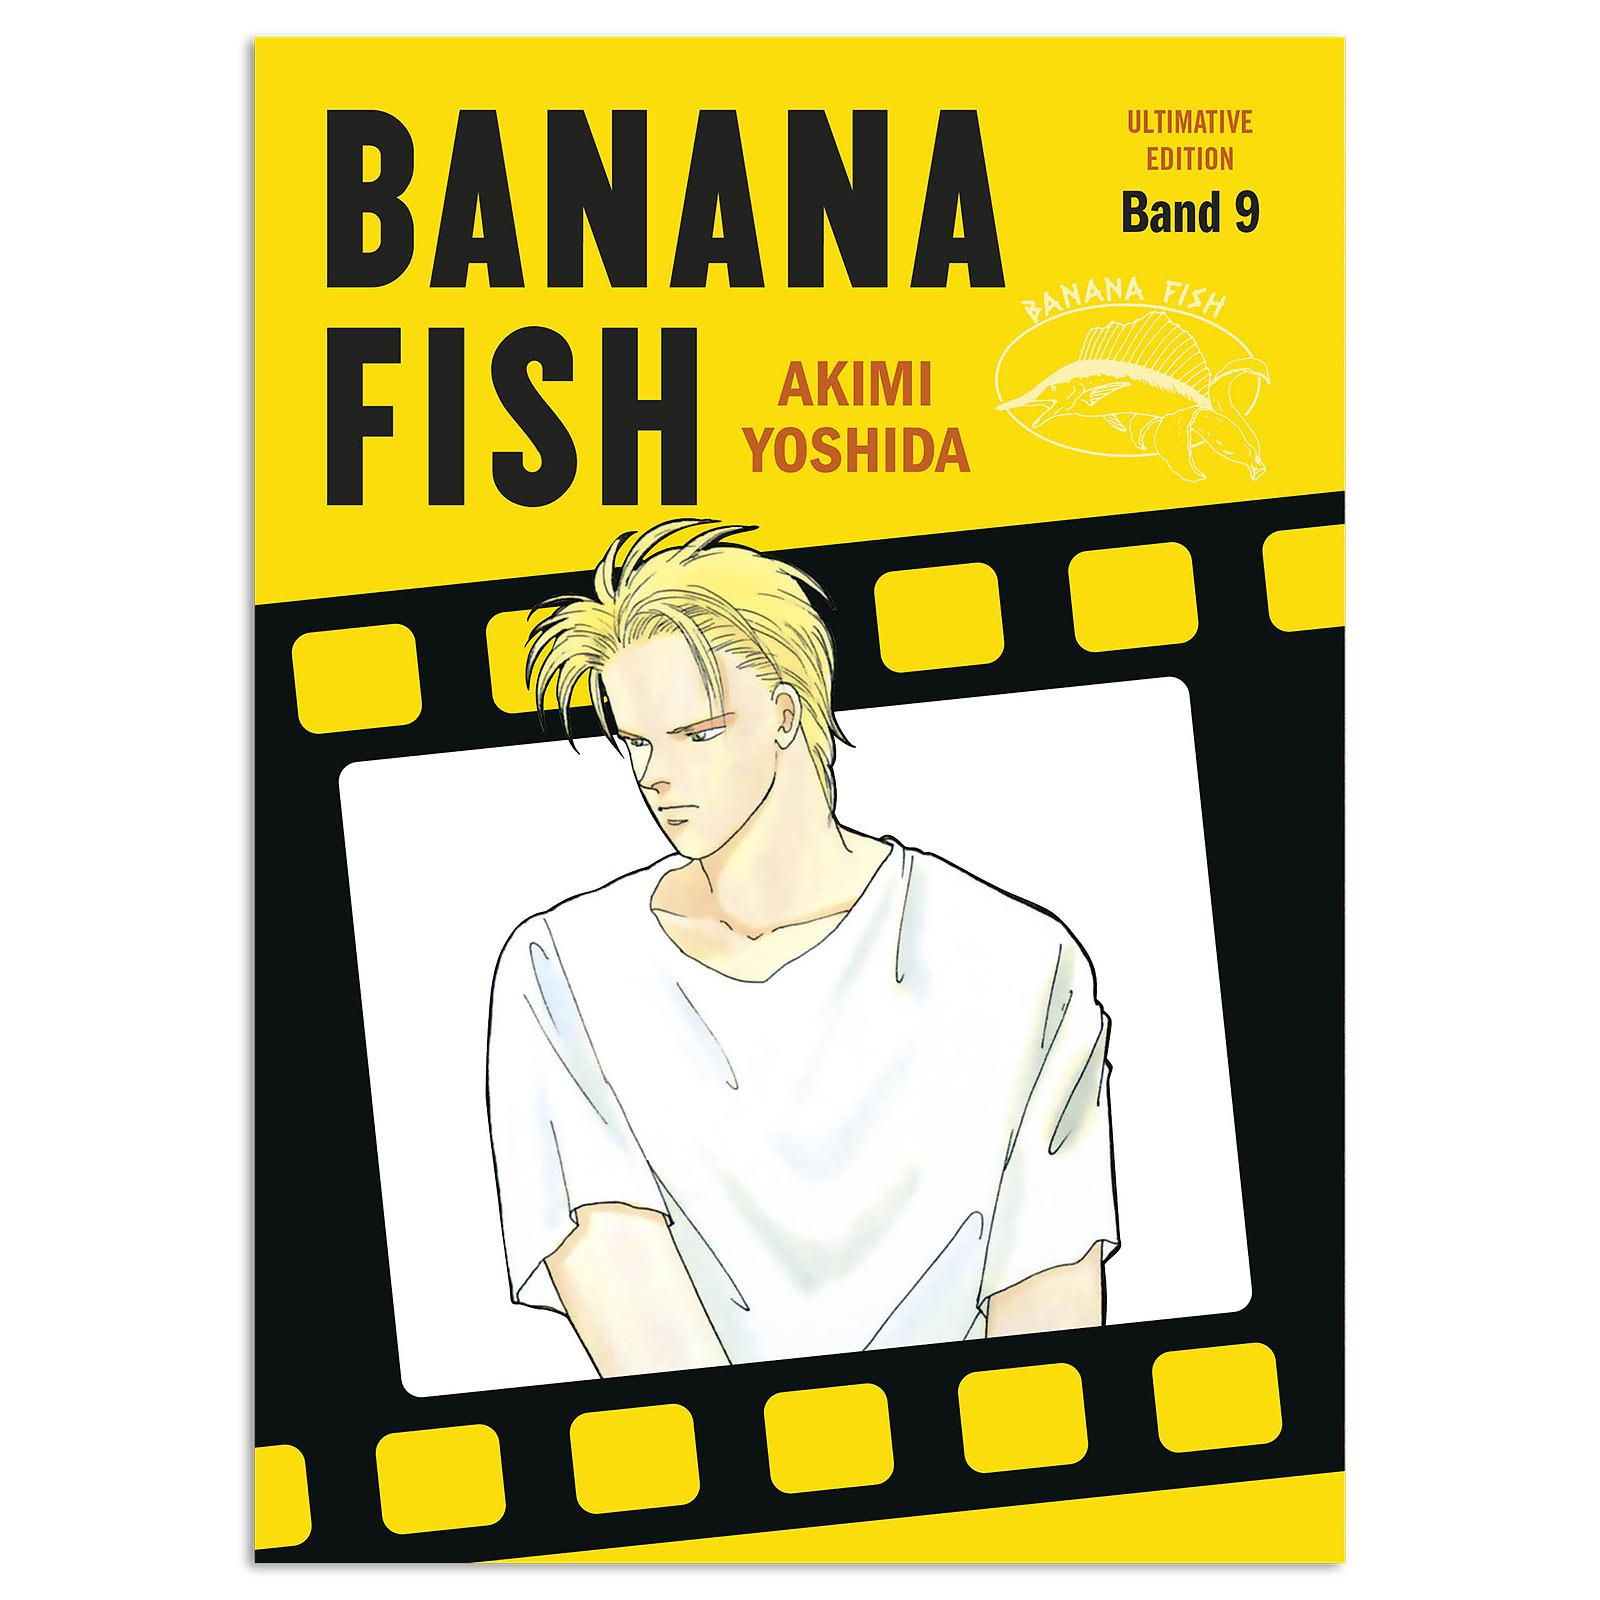 Banana Fish - Band 9 Taschenbuch Ultimate Edition